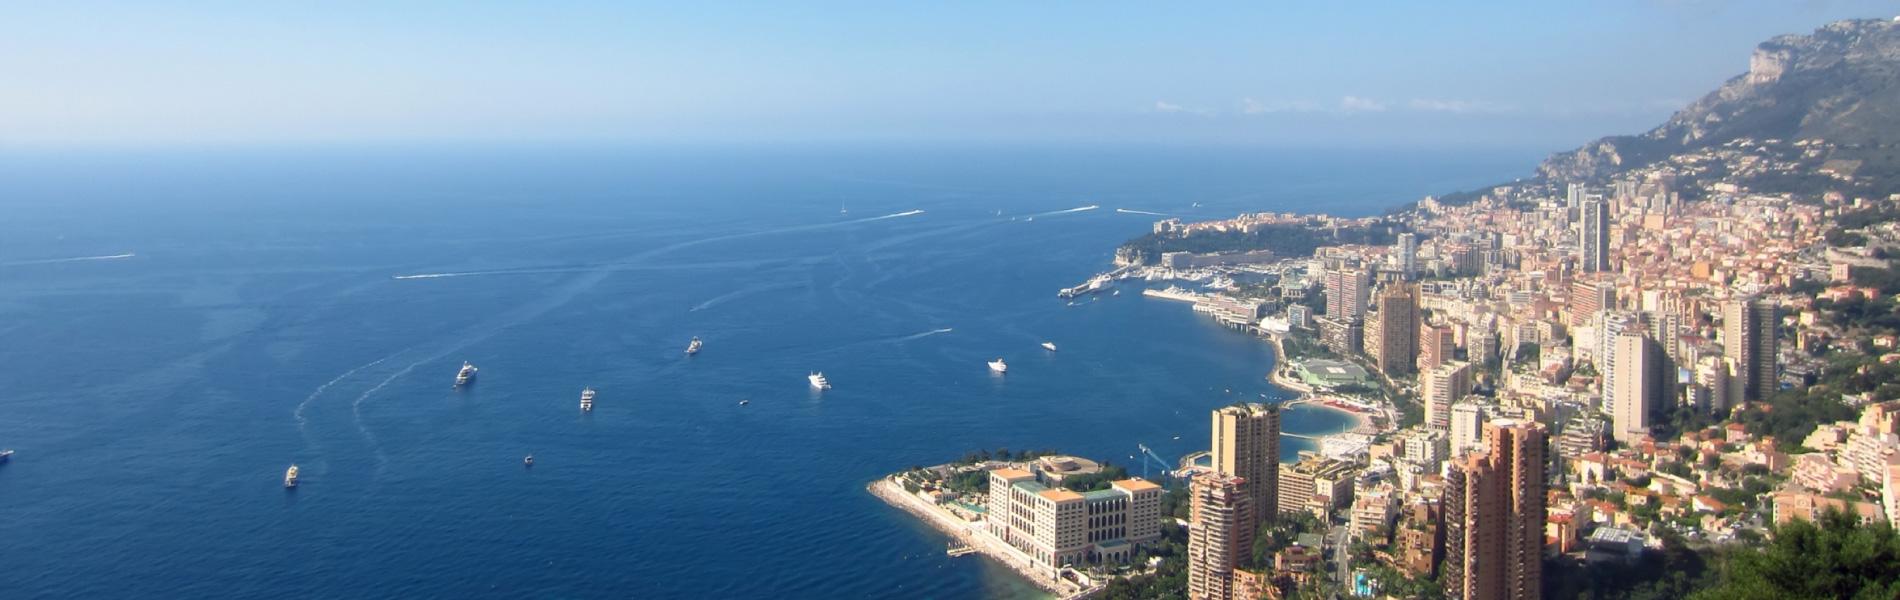 Monaco : vers une ville plus intelligente ?